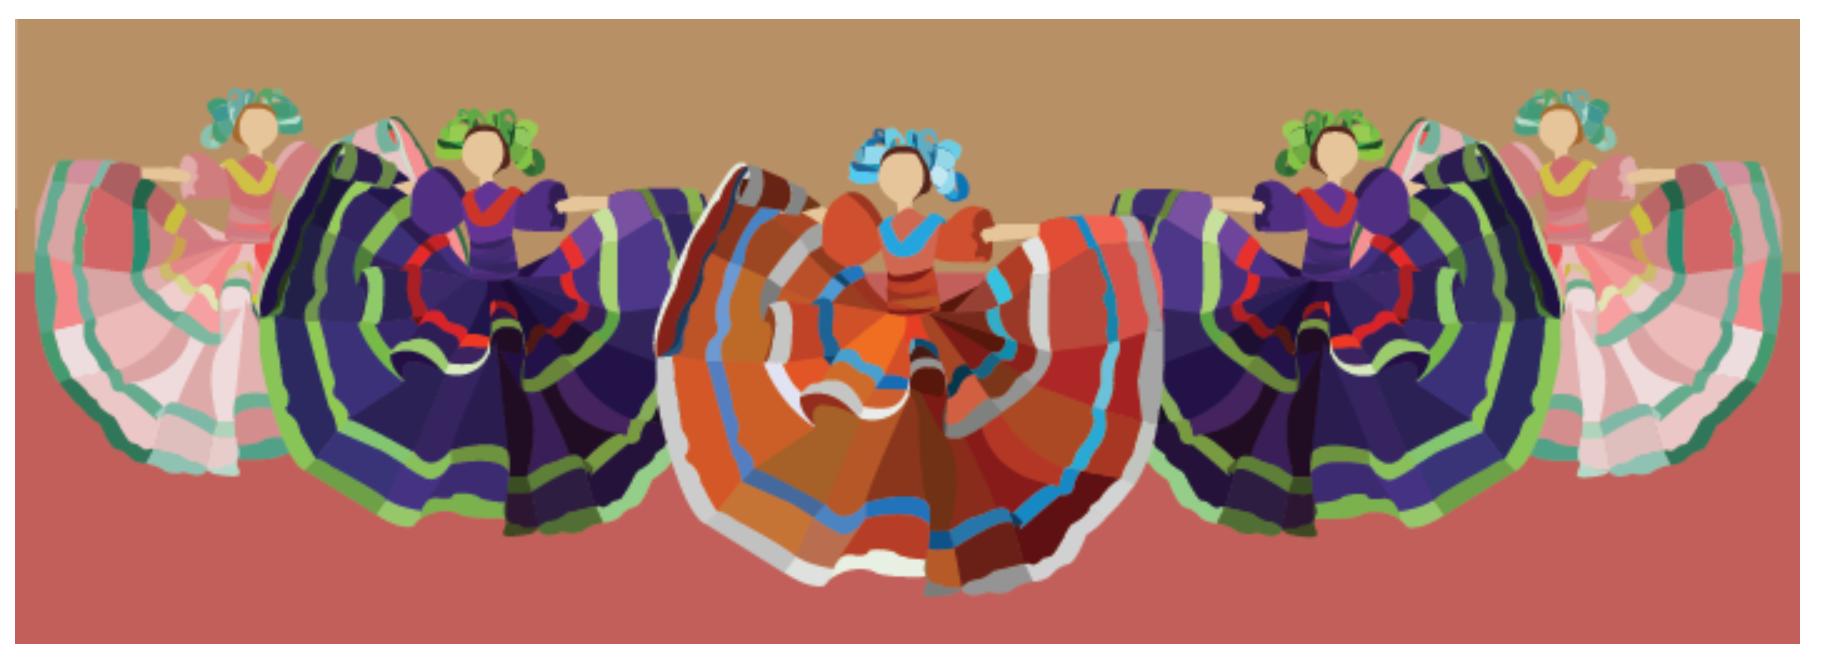 Cultural BAnner dancers